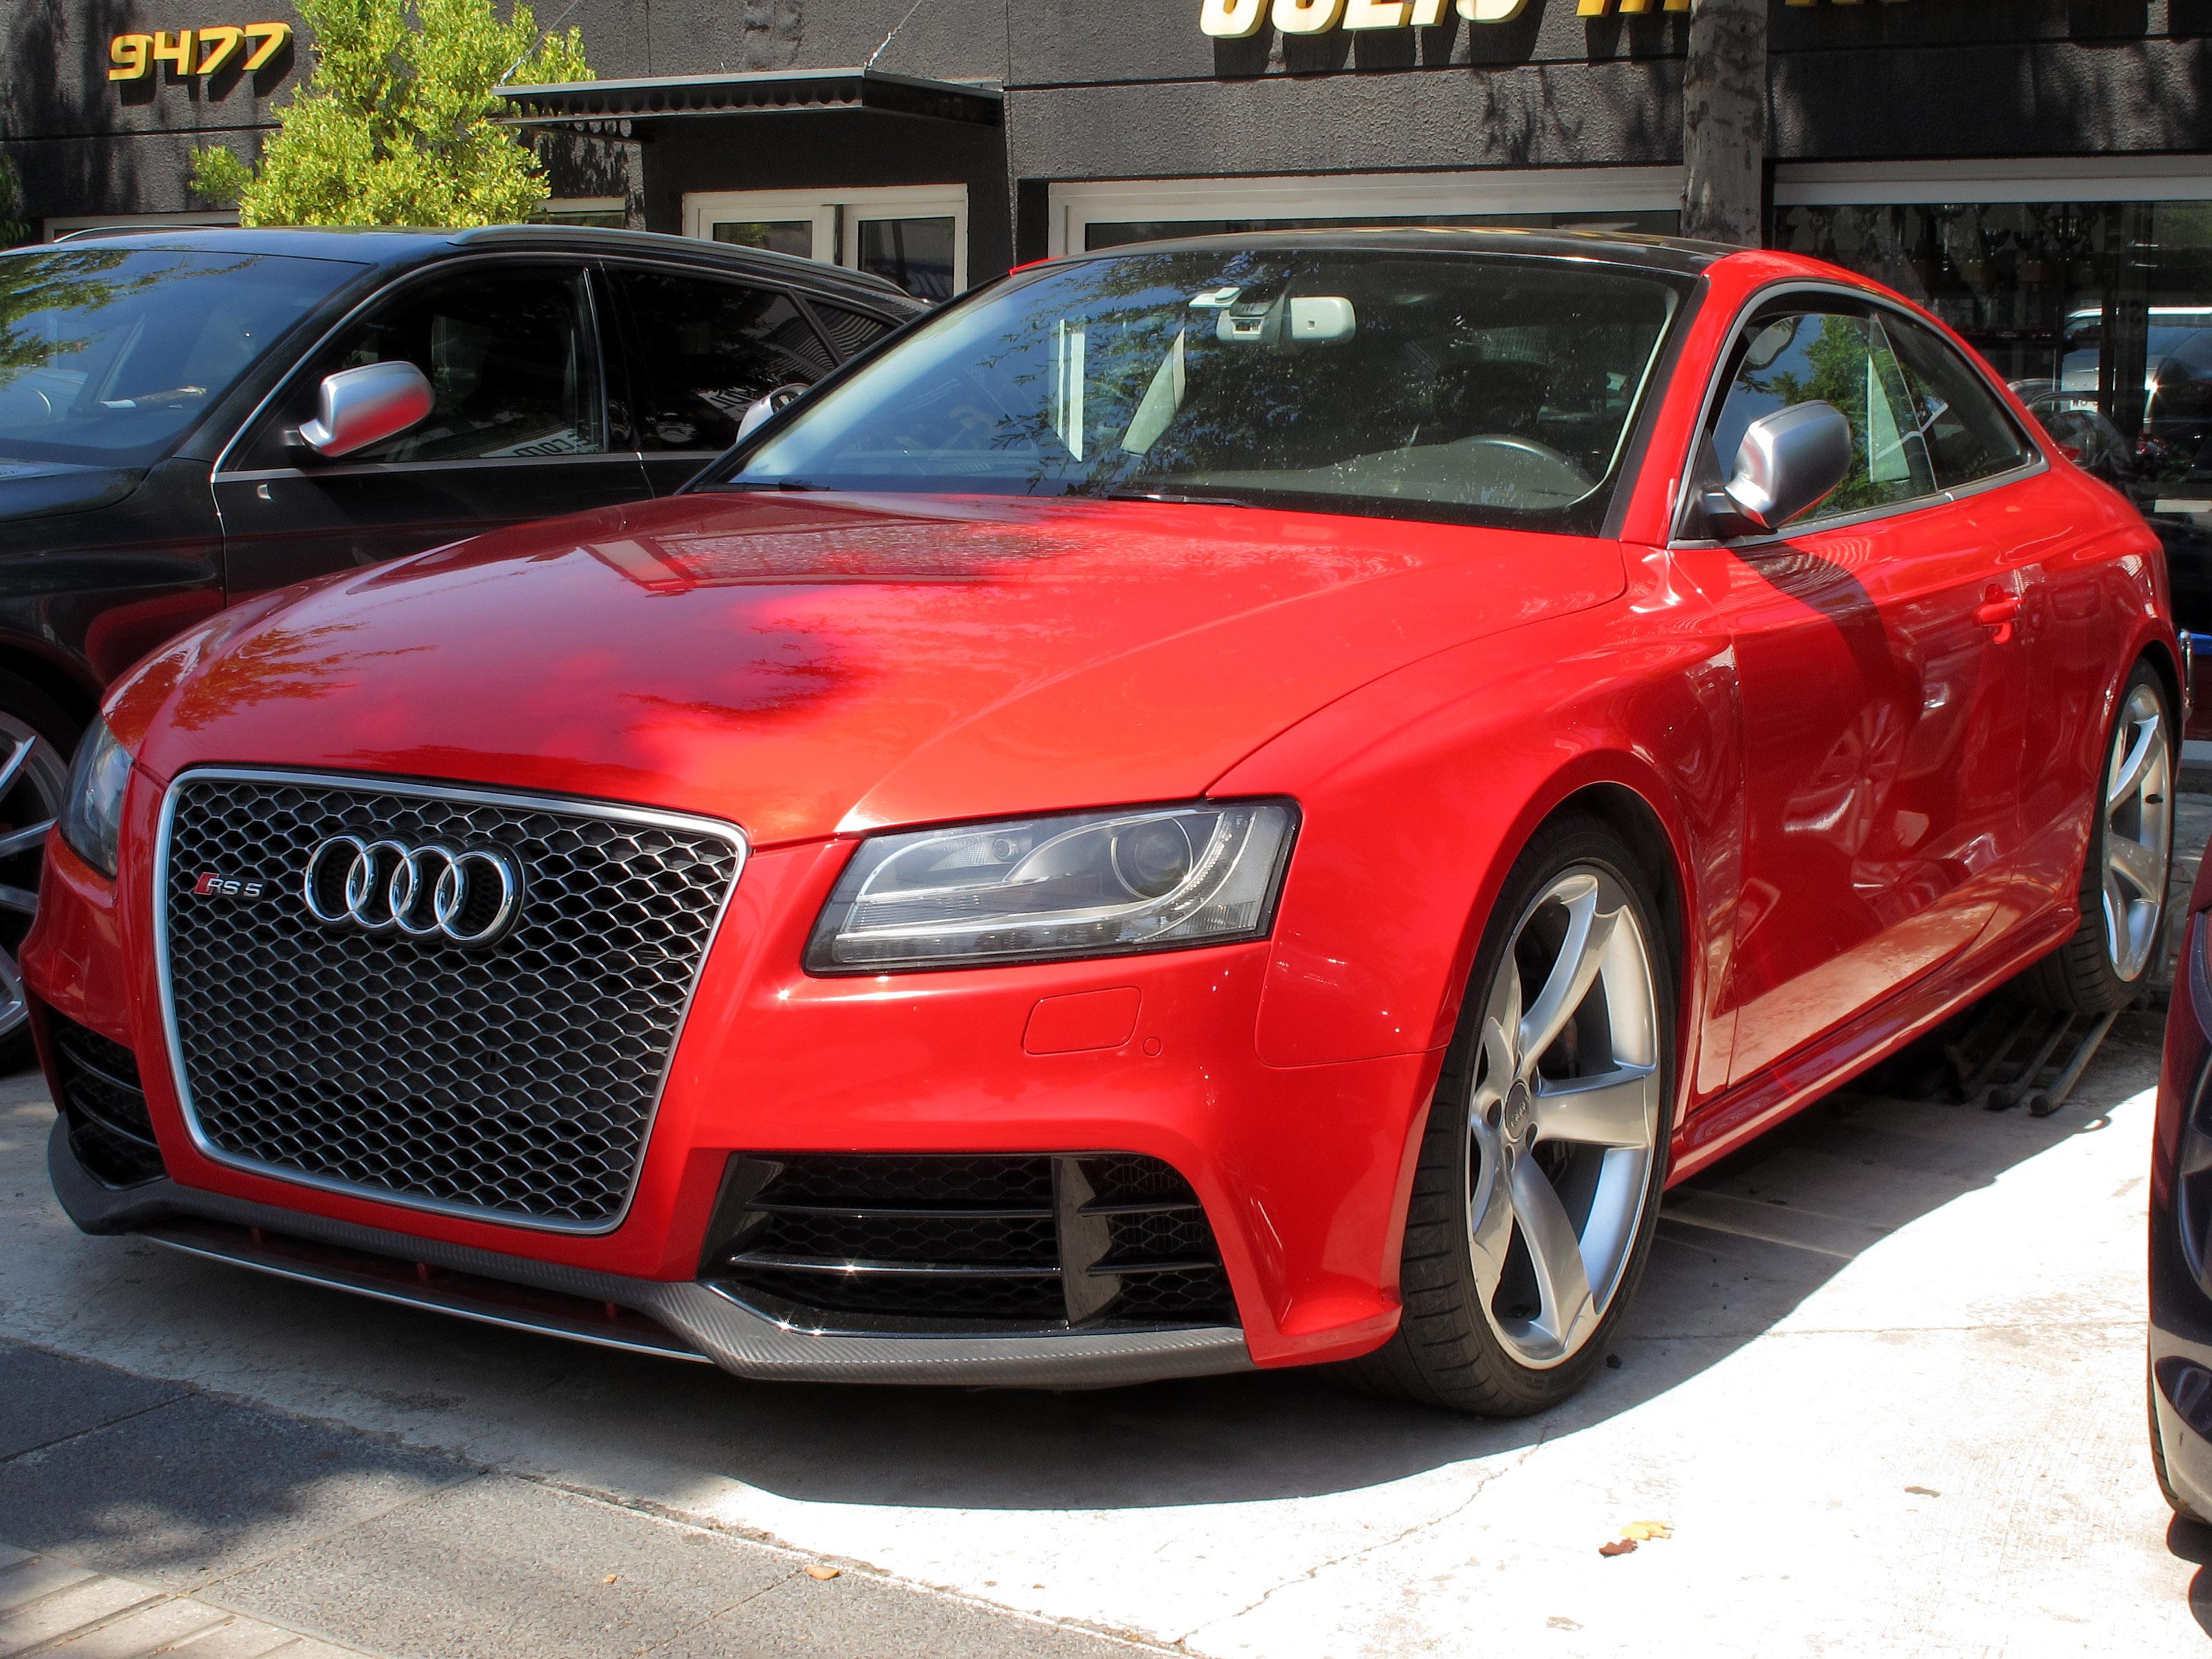 File Audi Rs5 2011 19255383270 Jpg Wikimedia Commons